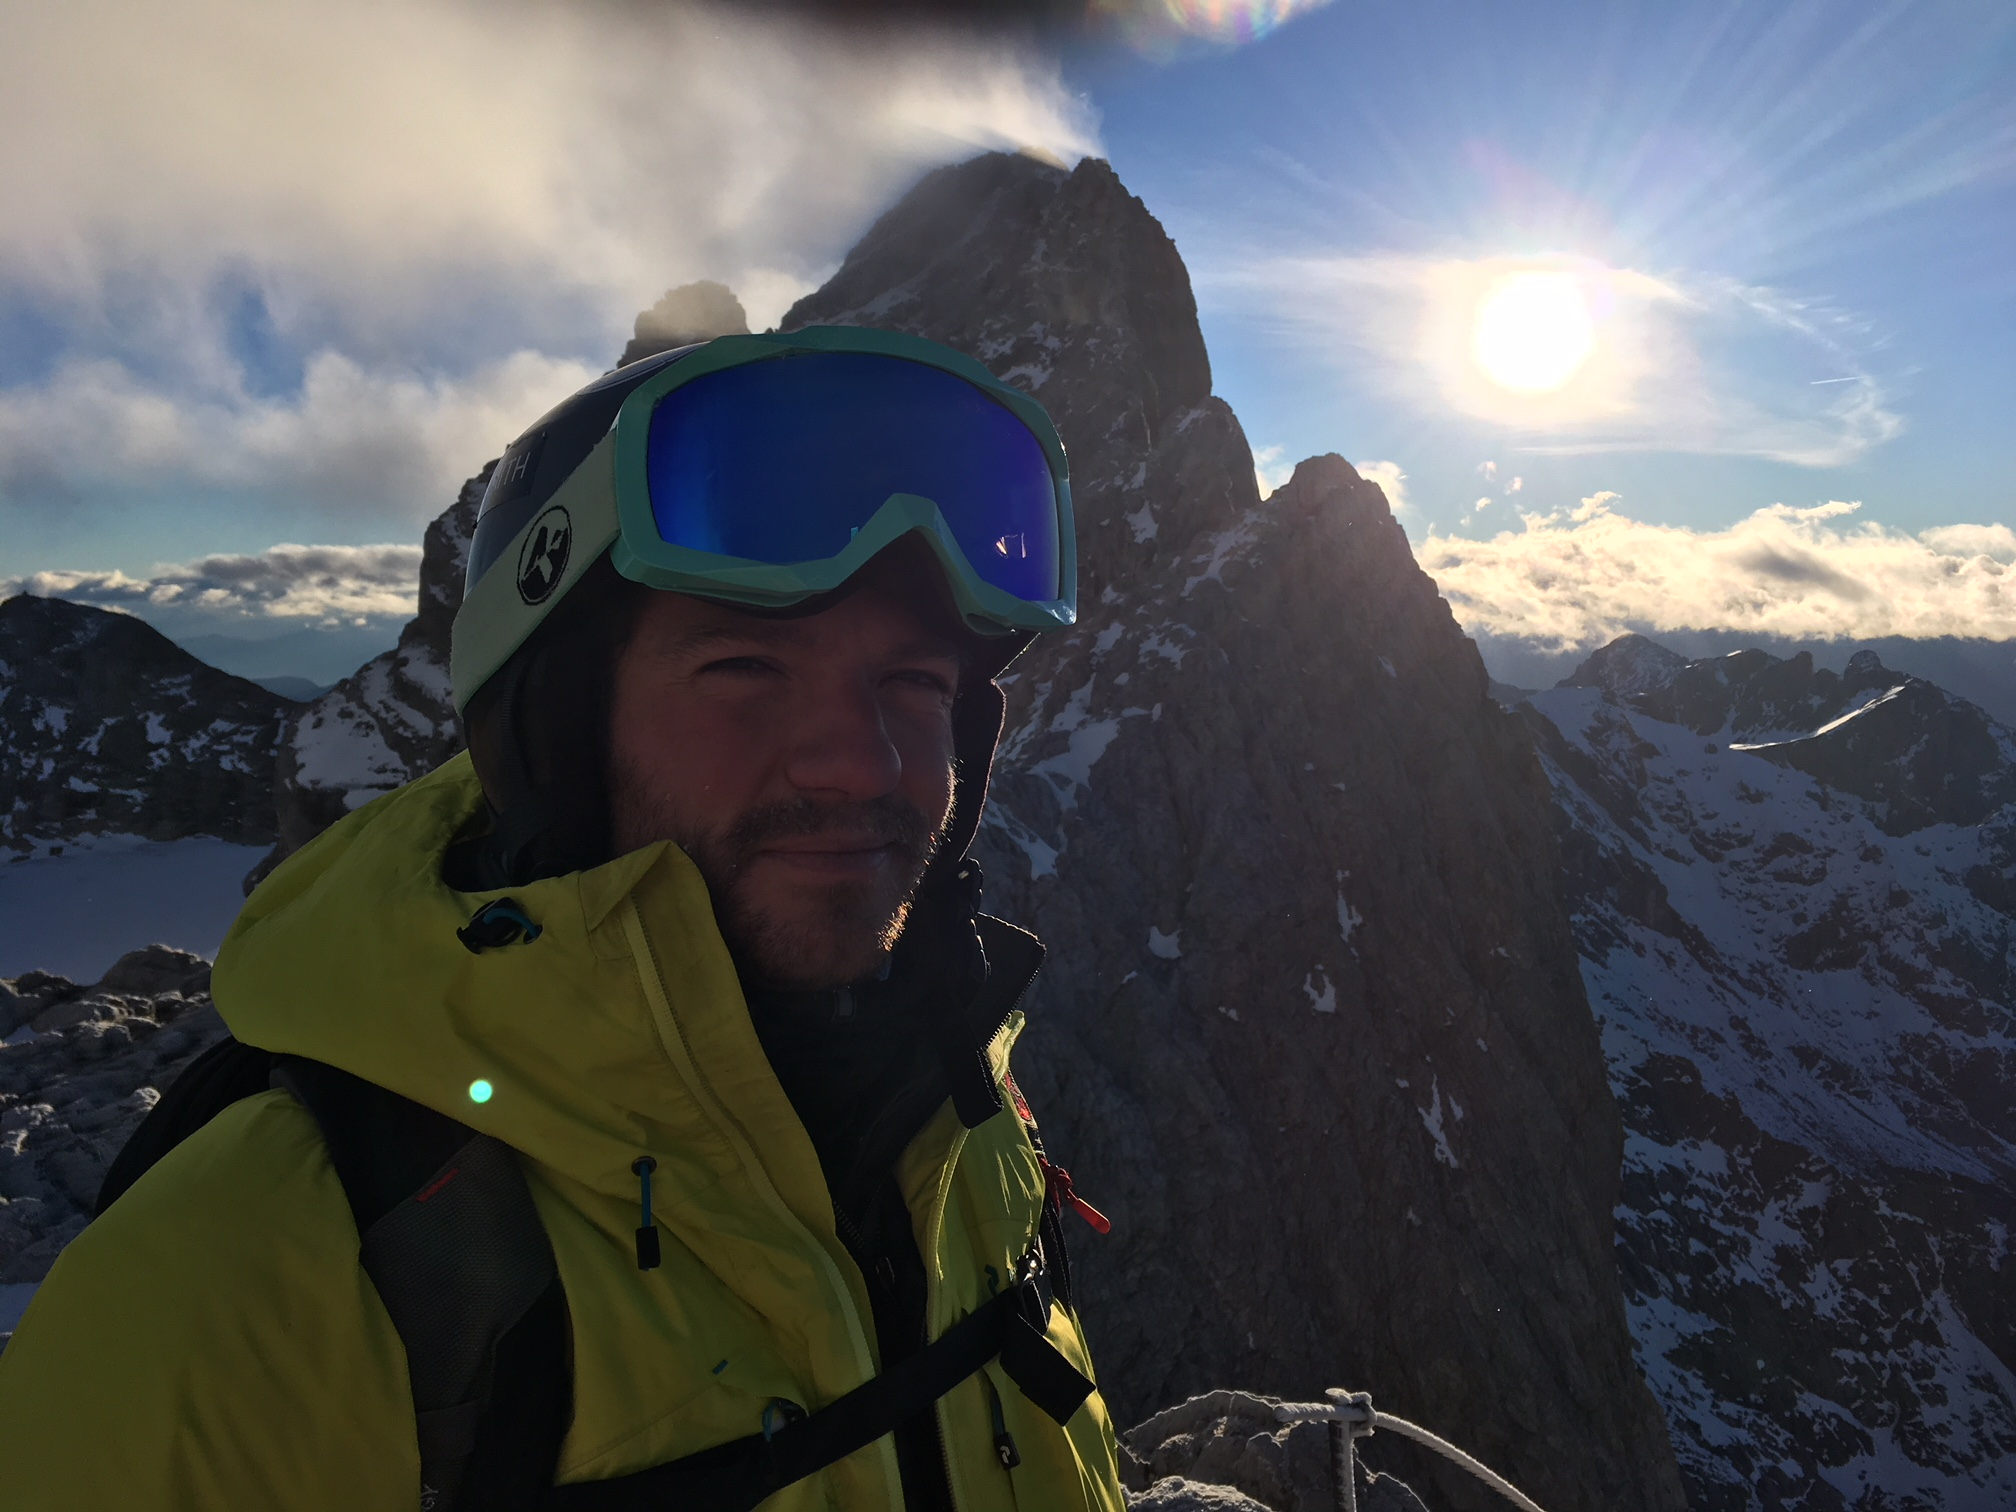 Clément Guyot - Abenteuer in eisiger Höhe